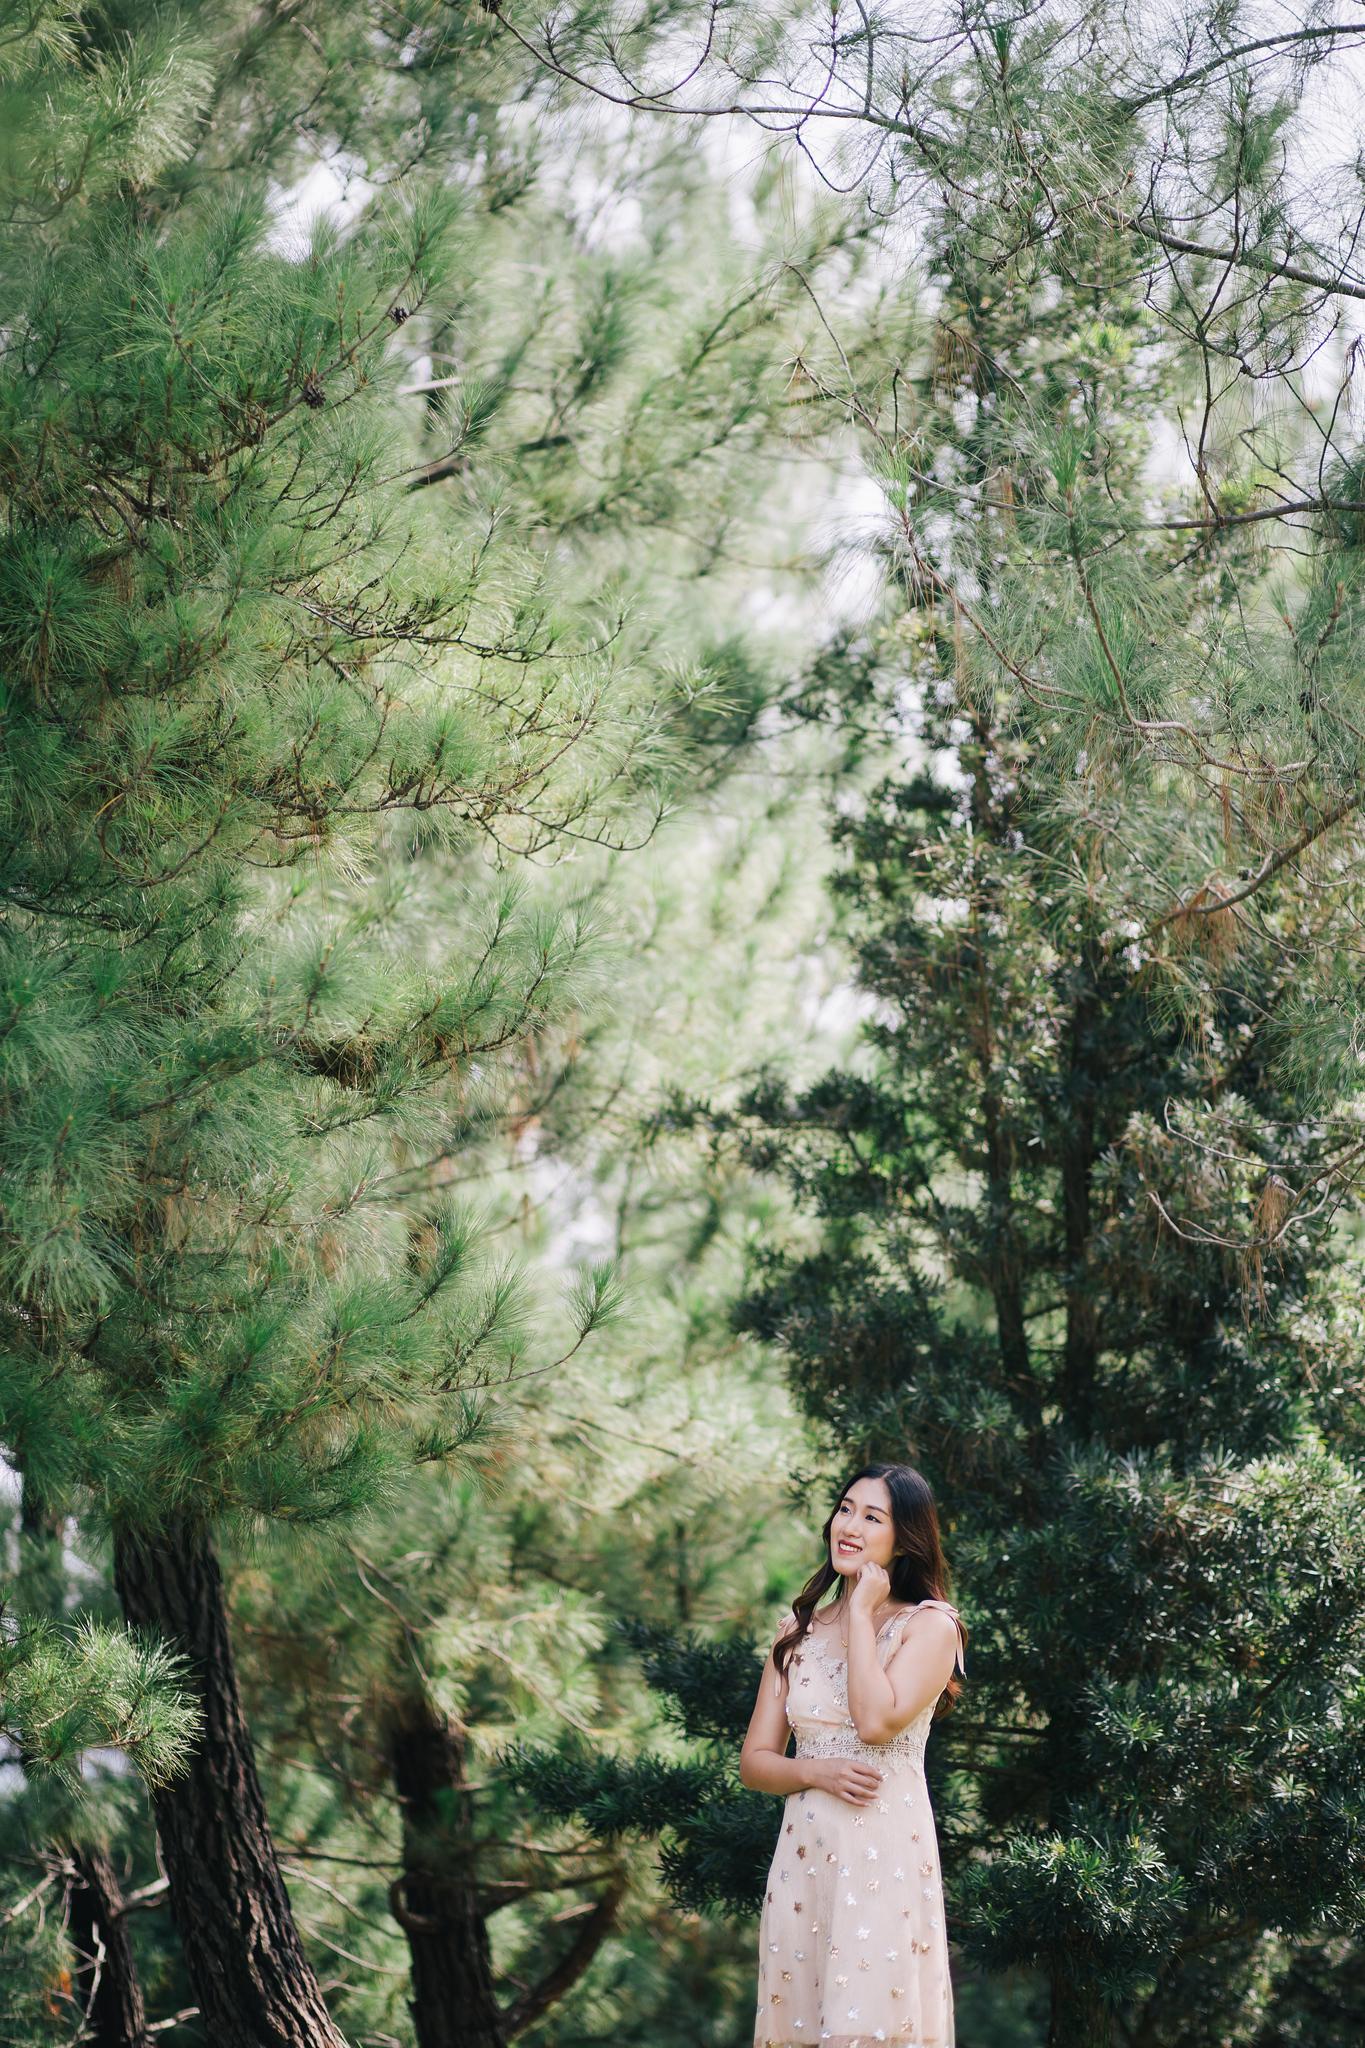 Professional Book Cover Album Cover Artist Portrait Photo Shoot